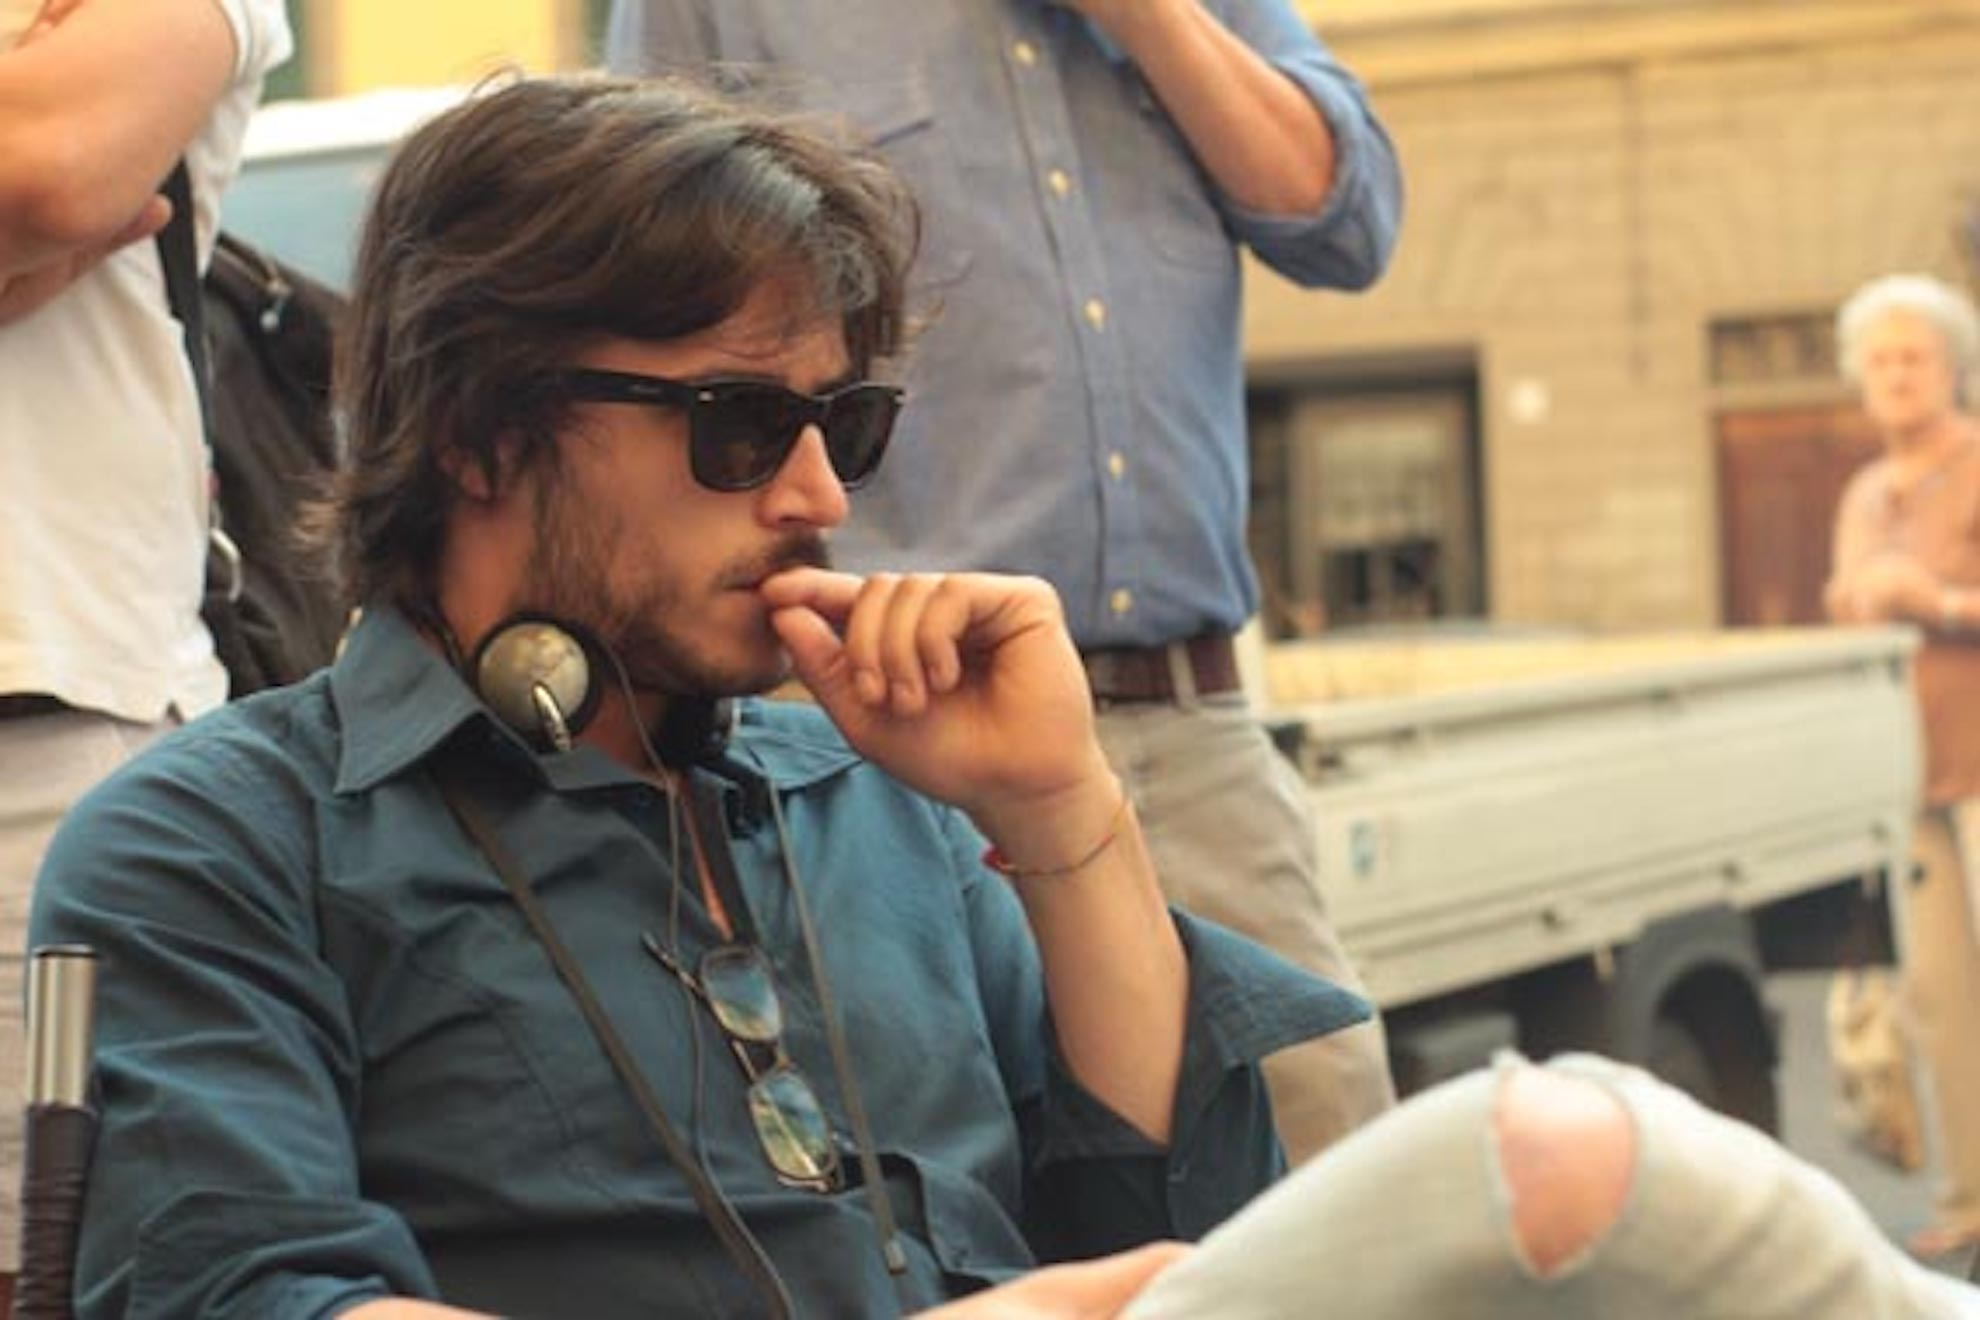 A Rende conferenza stampa di fine riprese del film GlassBoy